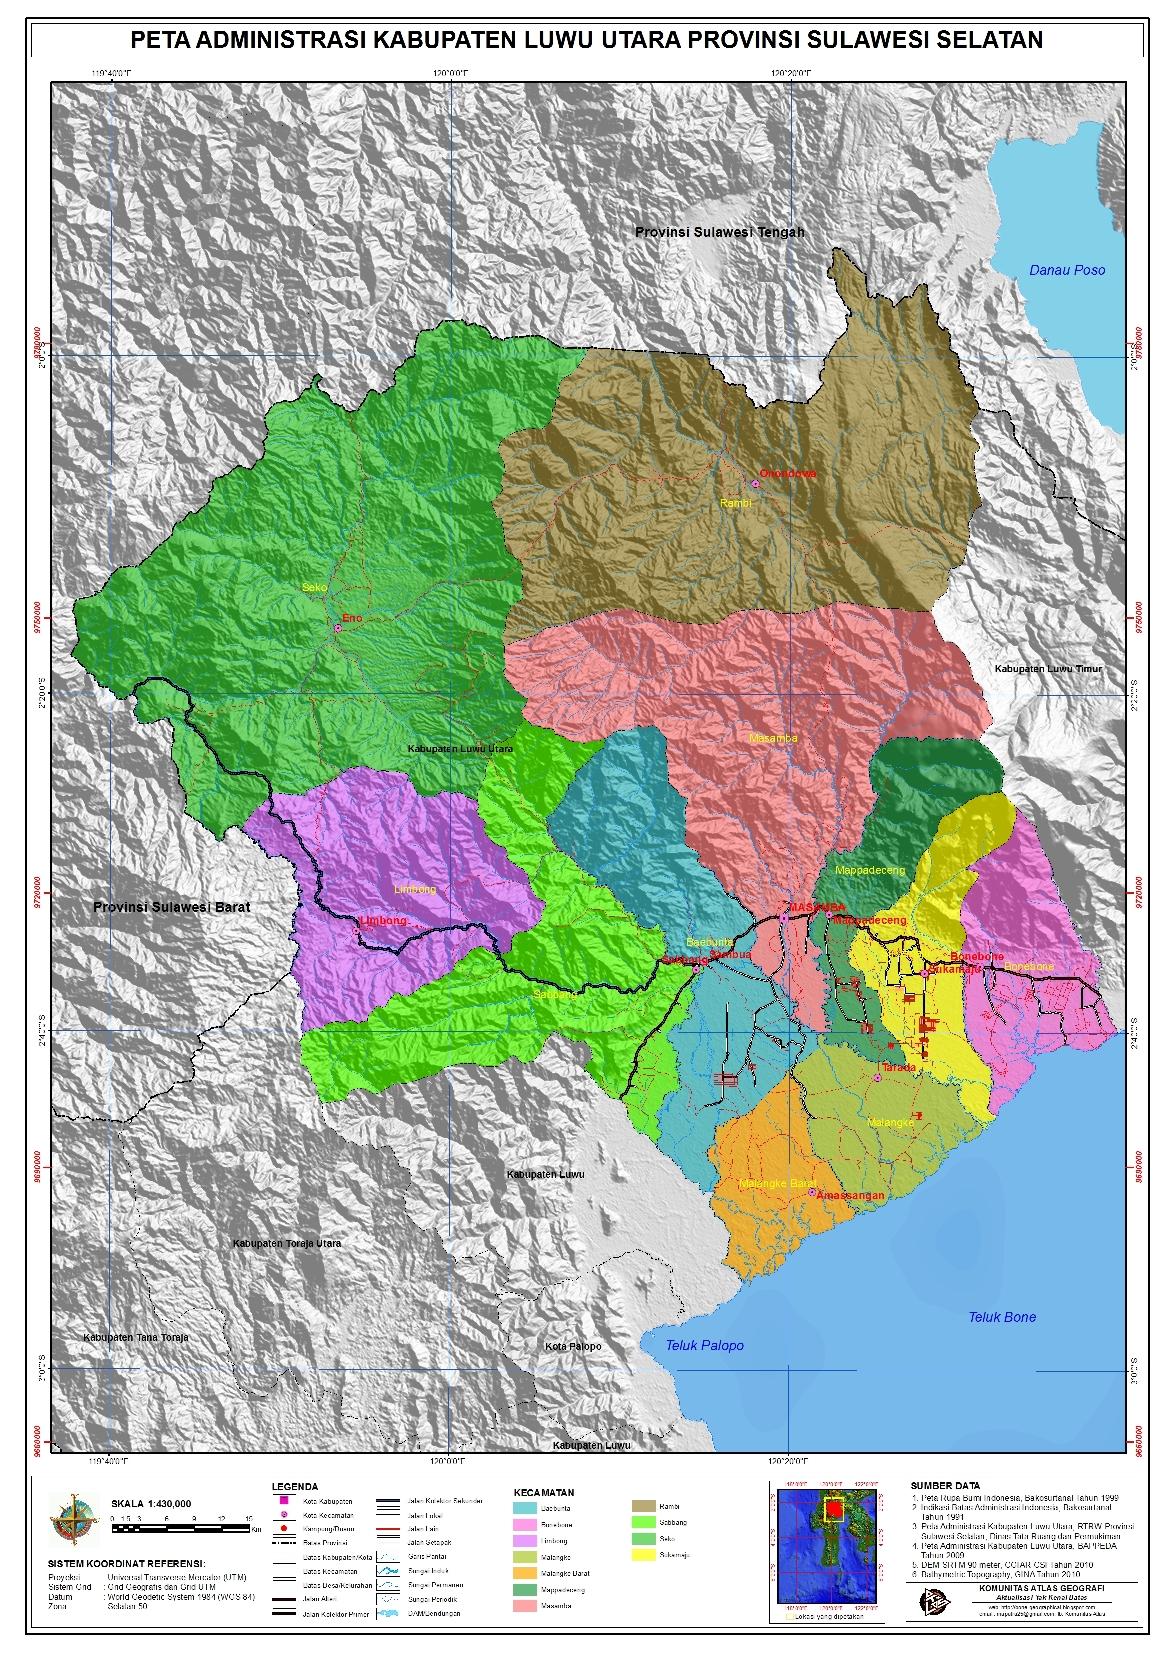 Tes Cpns Di Bengkulu Utara Lowongan Kerja Pt Pertamina Phe Wmo Info Cpns 2016 Peta Administrasi Bengkulu Utara